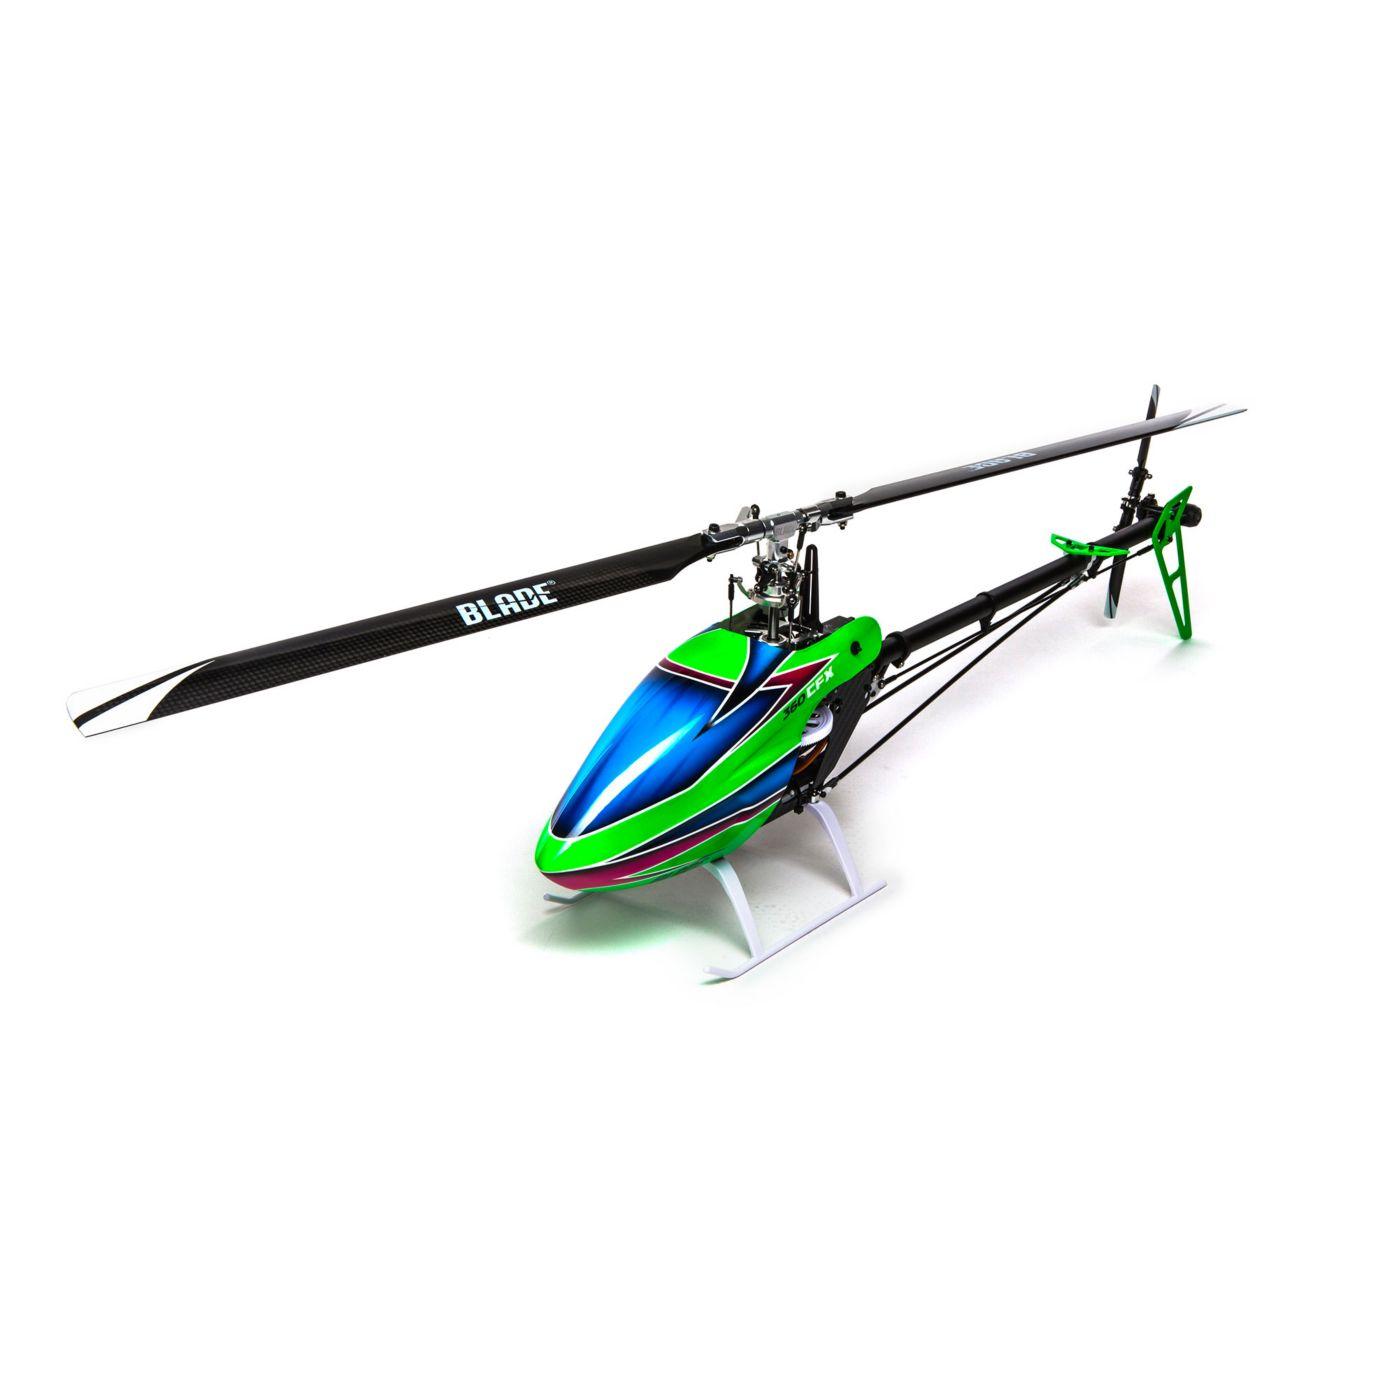 Blade 360 CFX 3S Elicottero rc bnf 3d 02